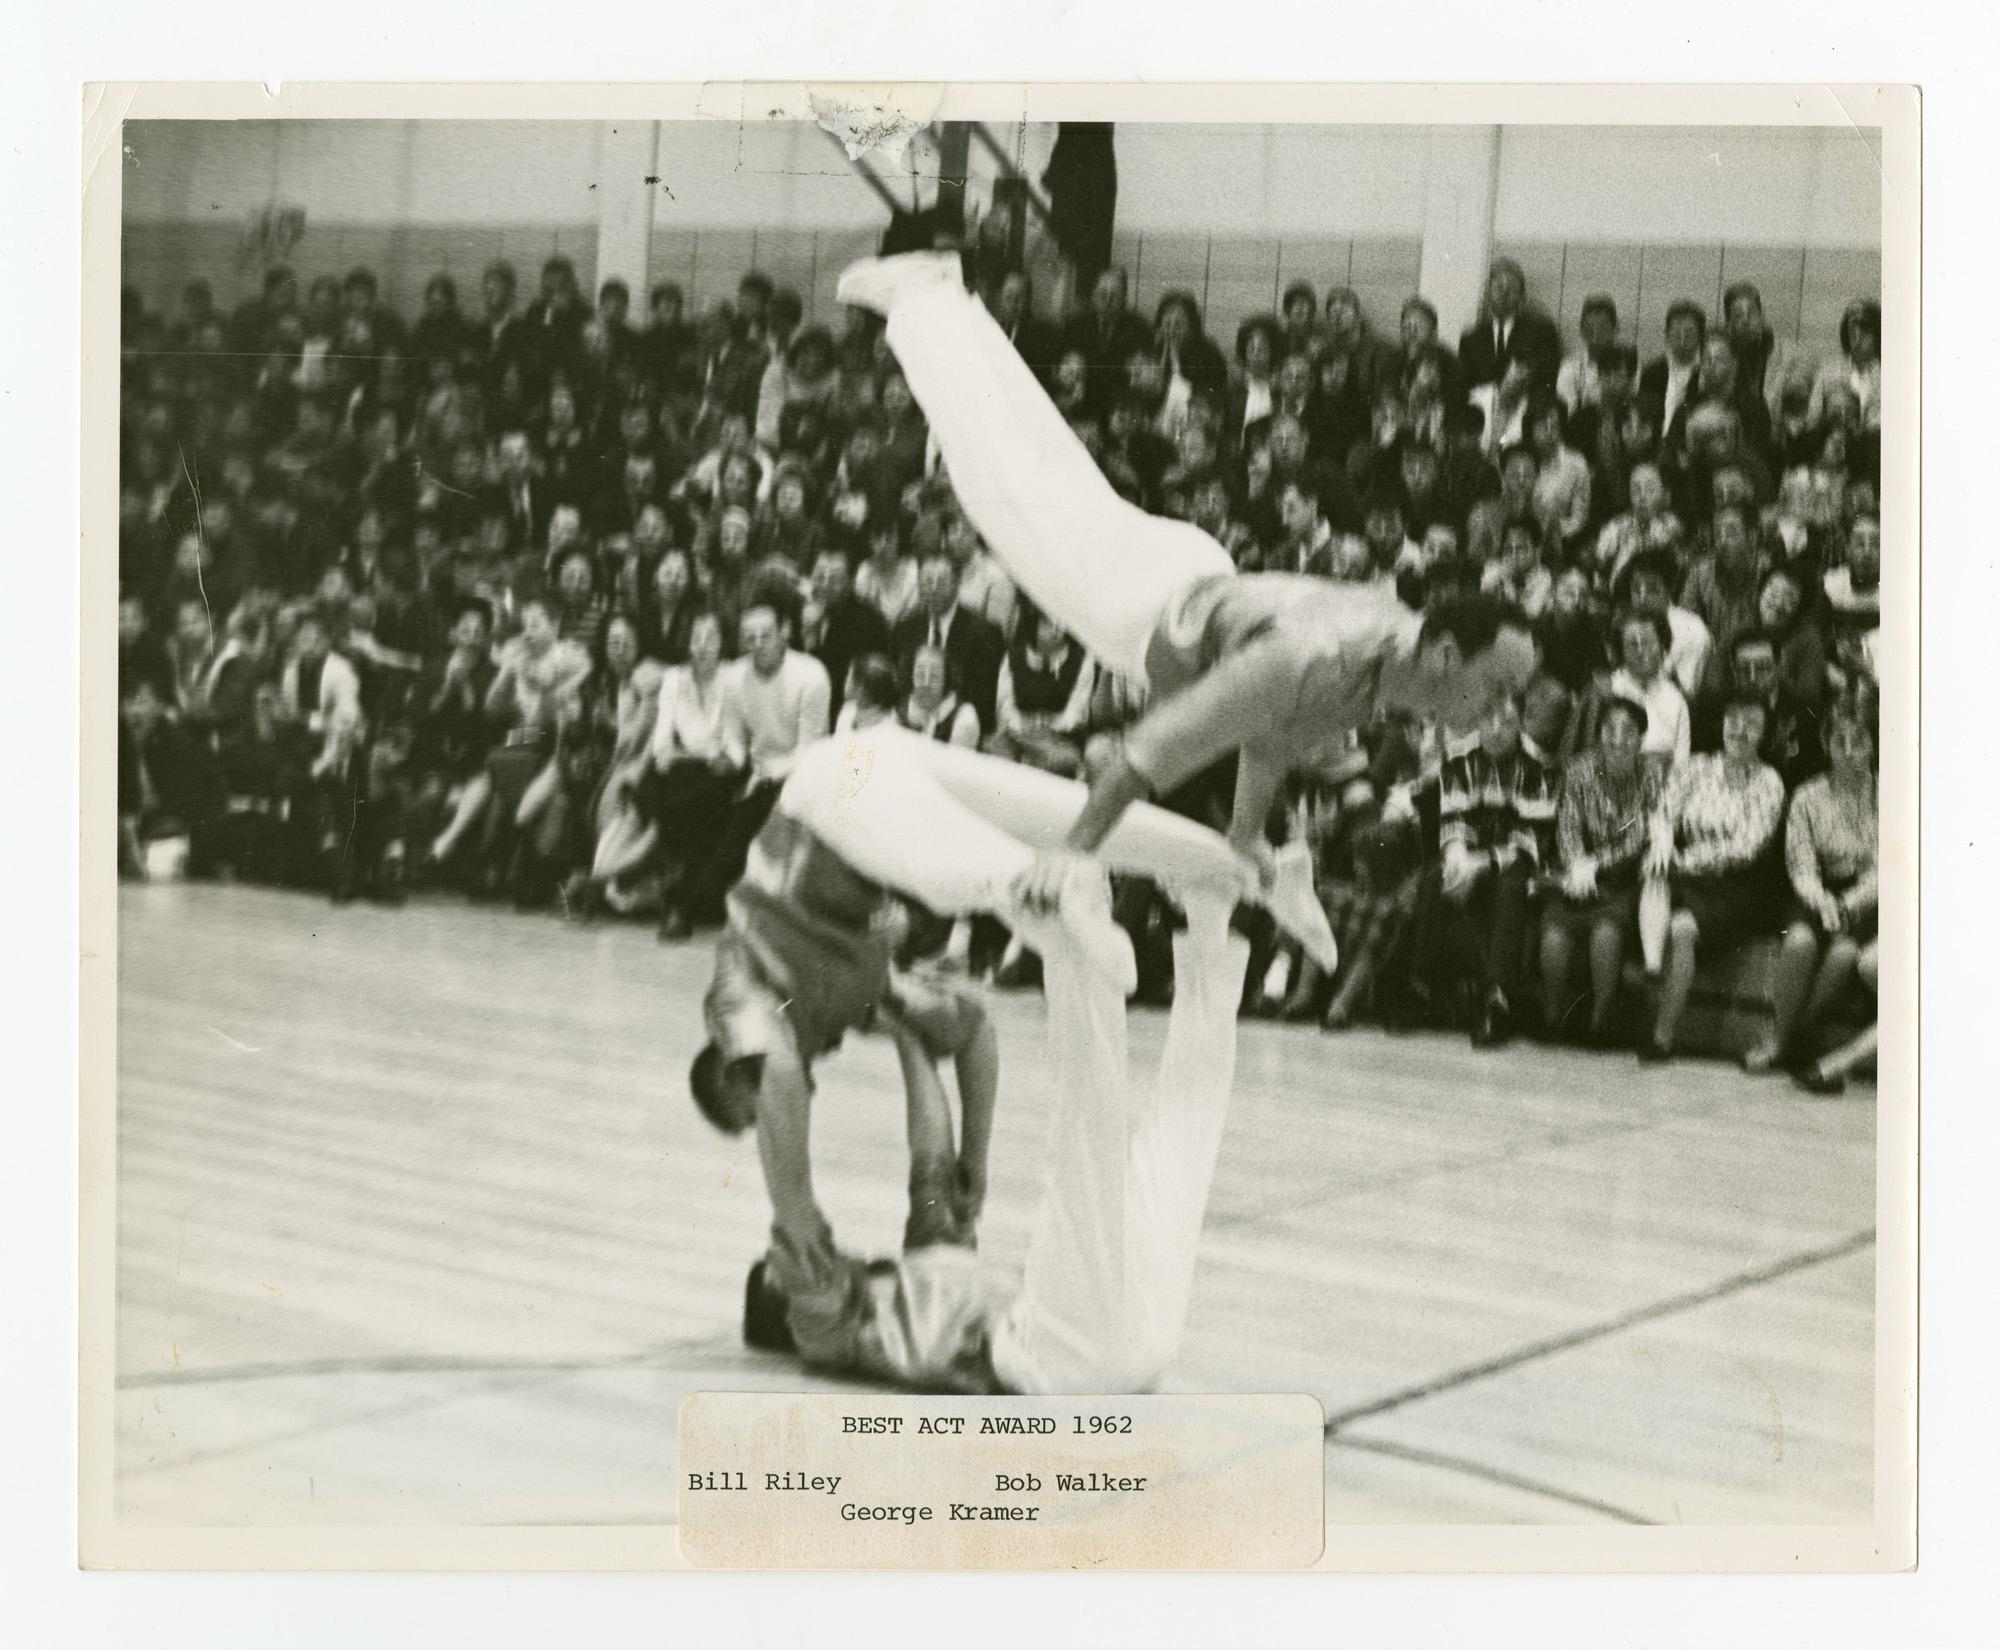 1962 - Men's Triples Balancing